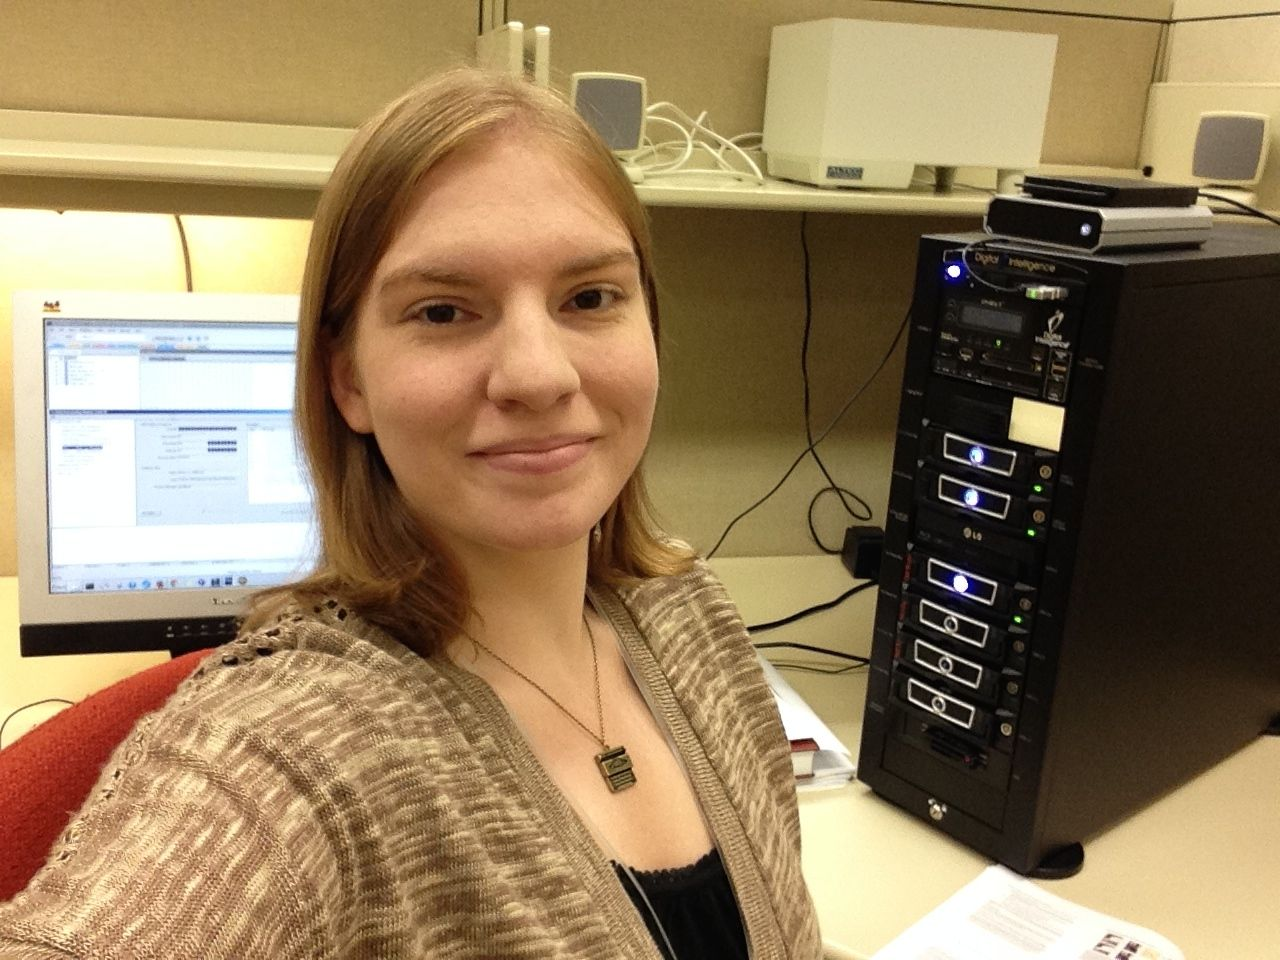 Rachel McPherson, M.L.I.S. '14, Processing and Digitization Technician, Cleveland Museum of Art